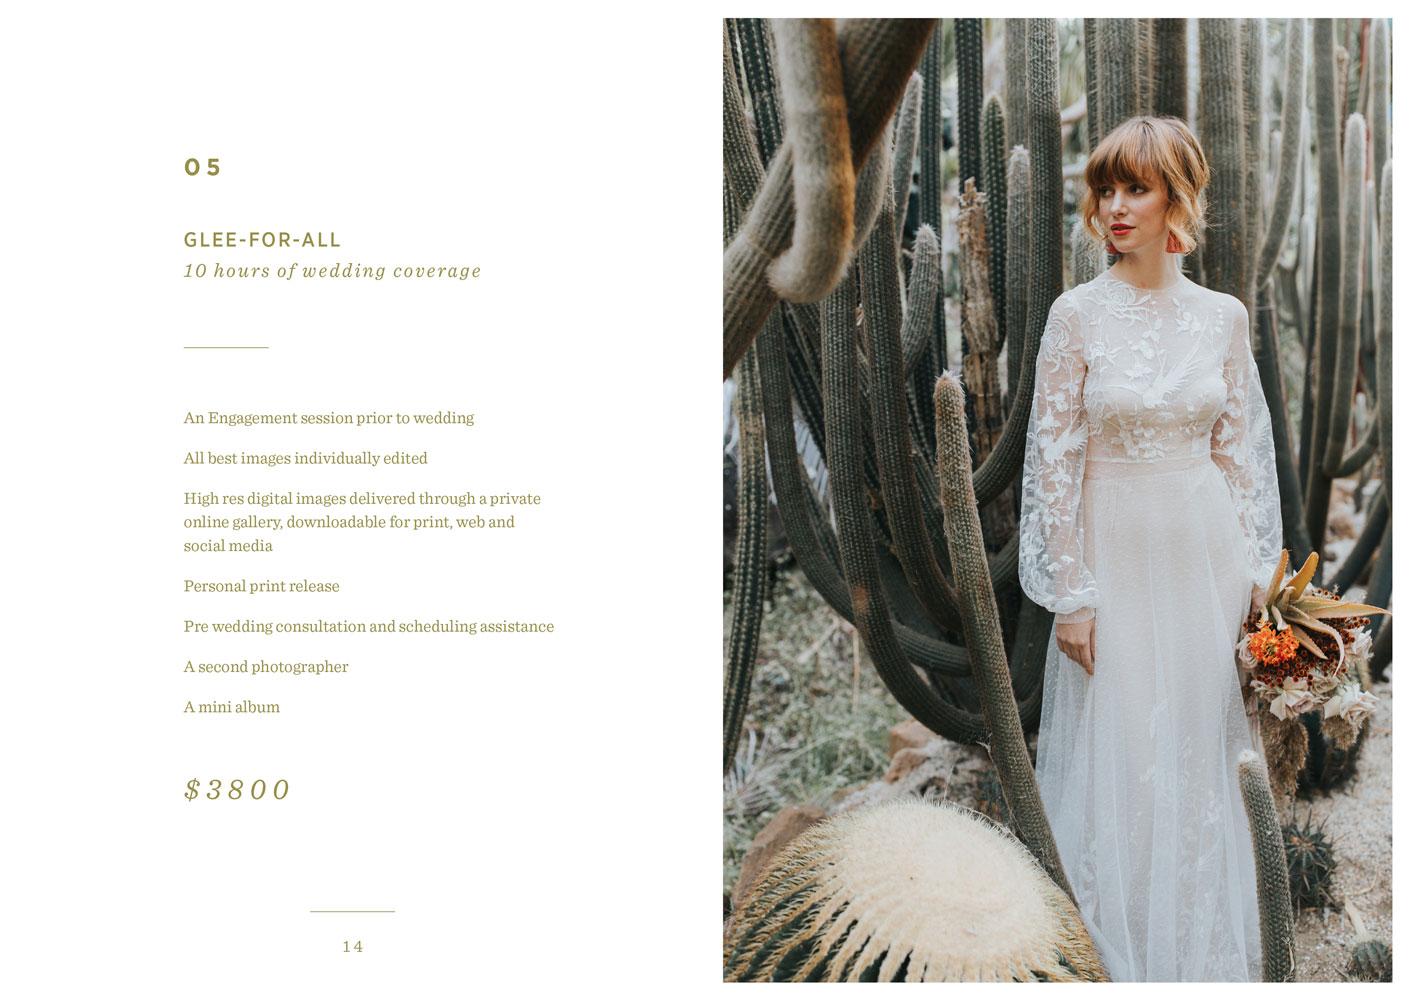 MallorySparkles_Weddings_20198.jpg